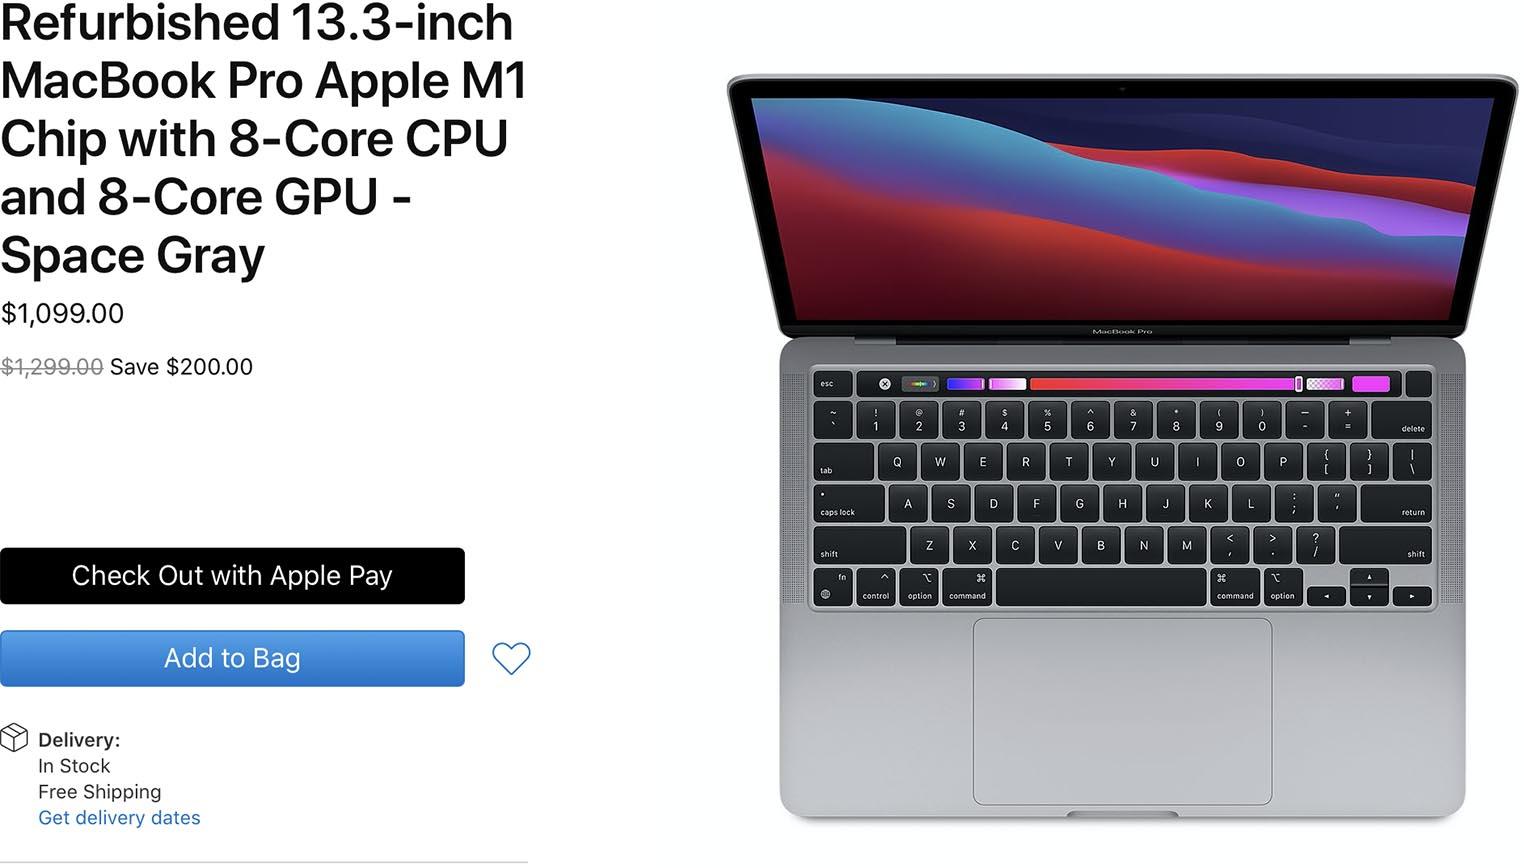 MacBook Pro M1 Refurb Store US